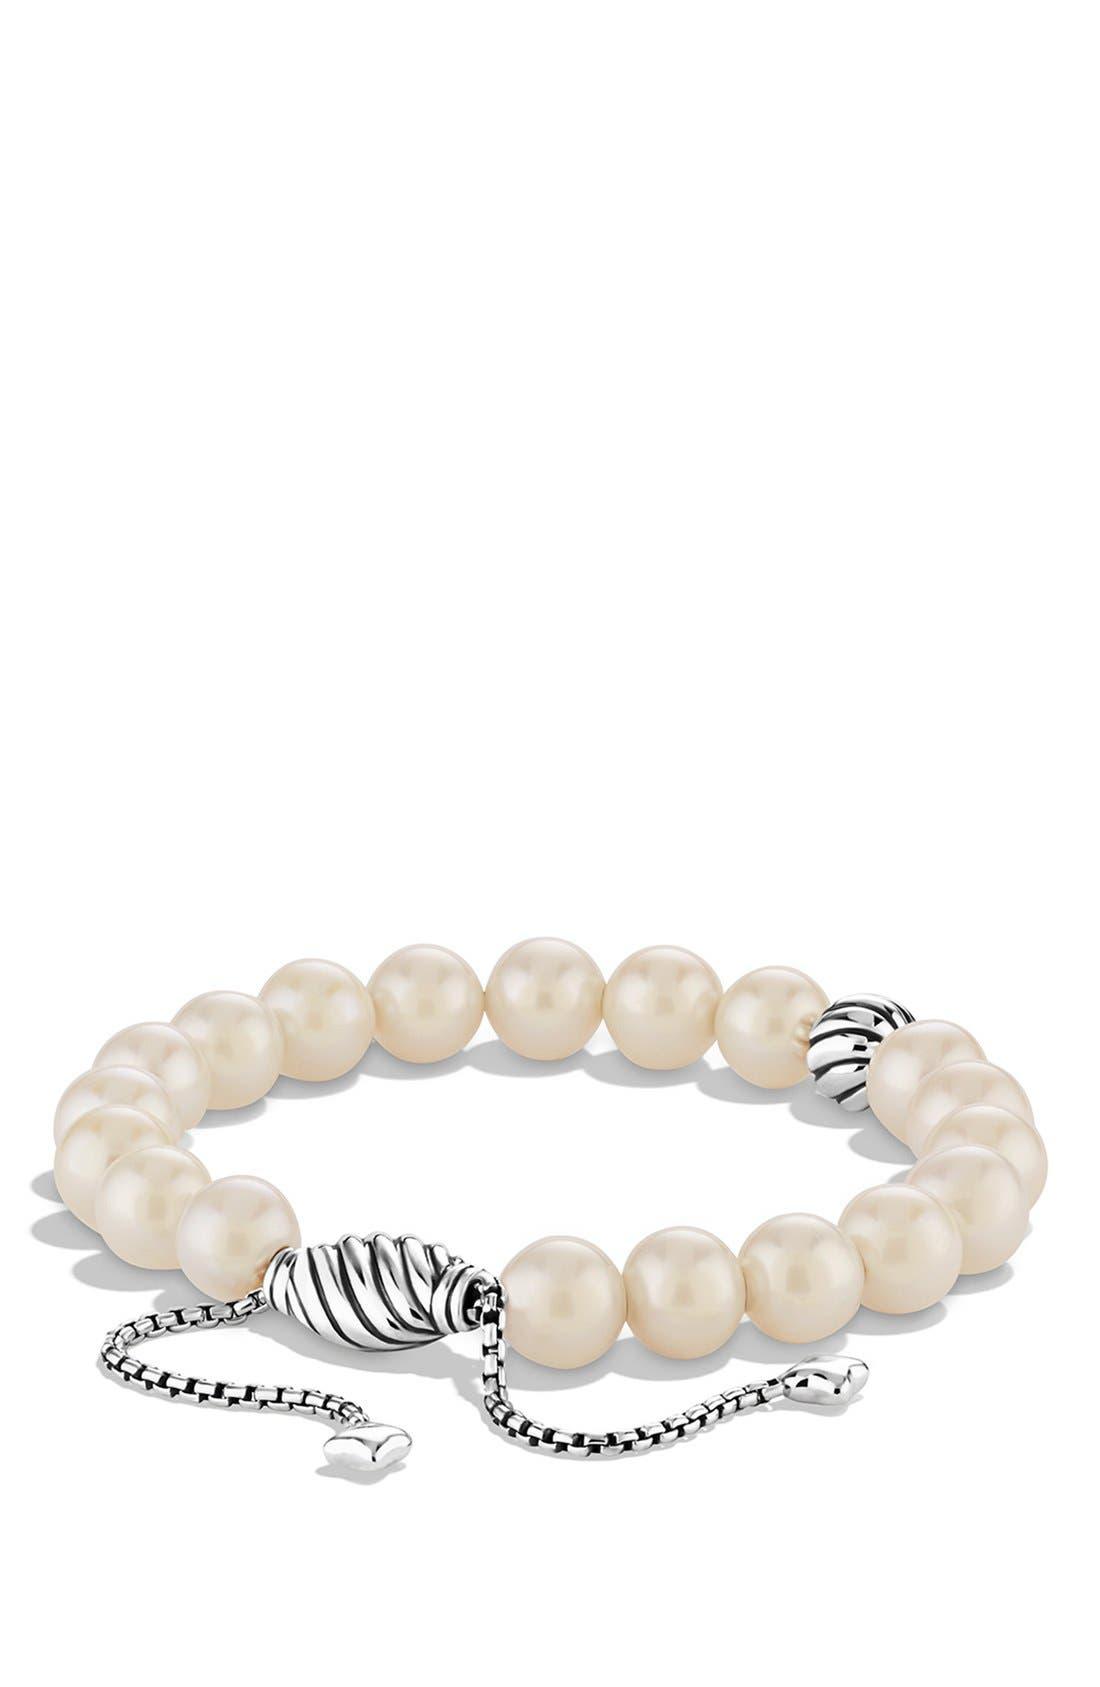 DAVID YURMAN 'Spiritual Beads' Bracelet with Pearls, Main, color, 101